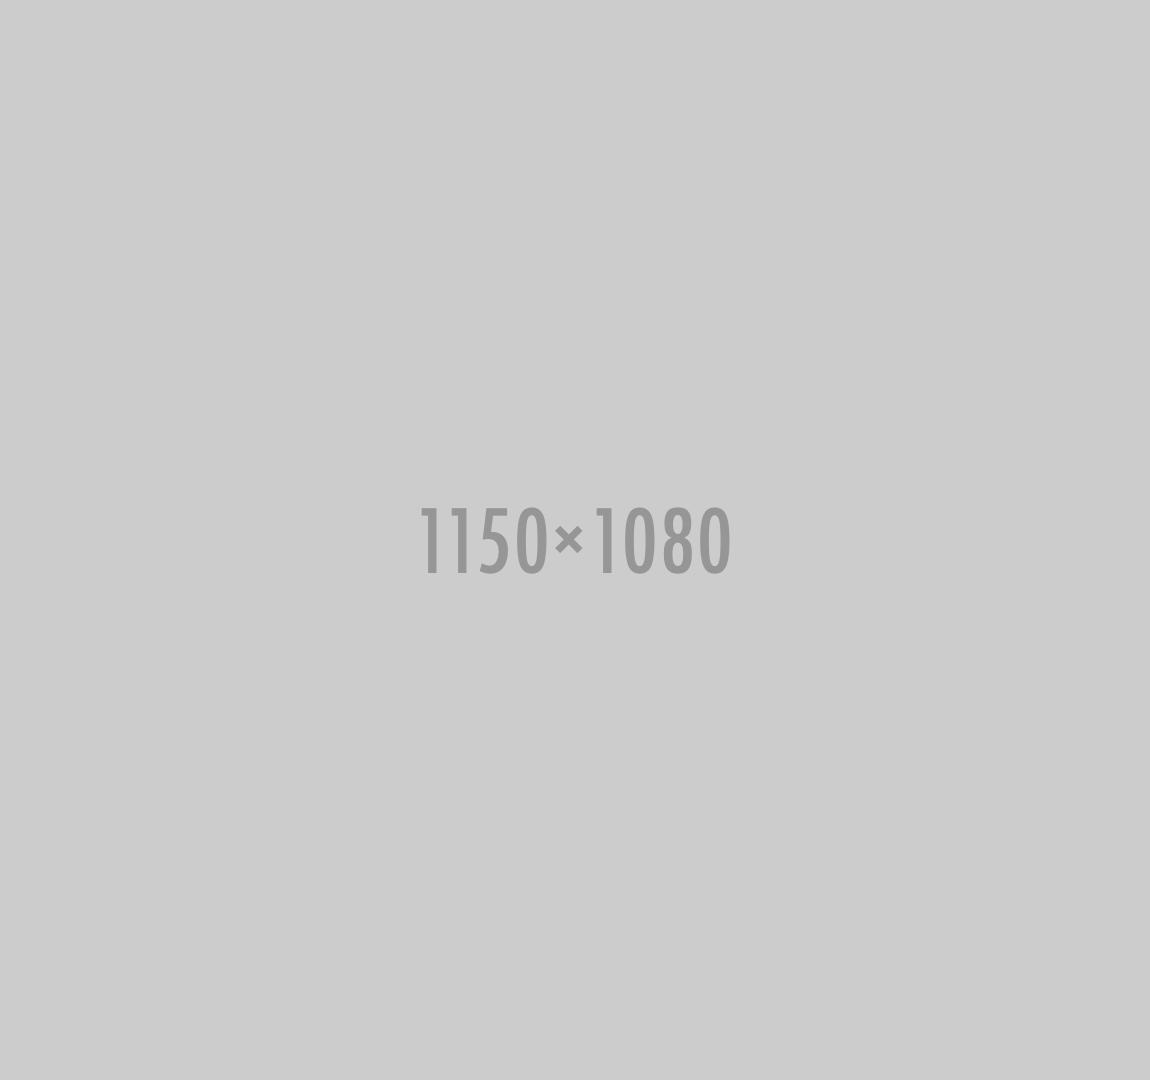 1150x1080